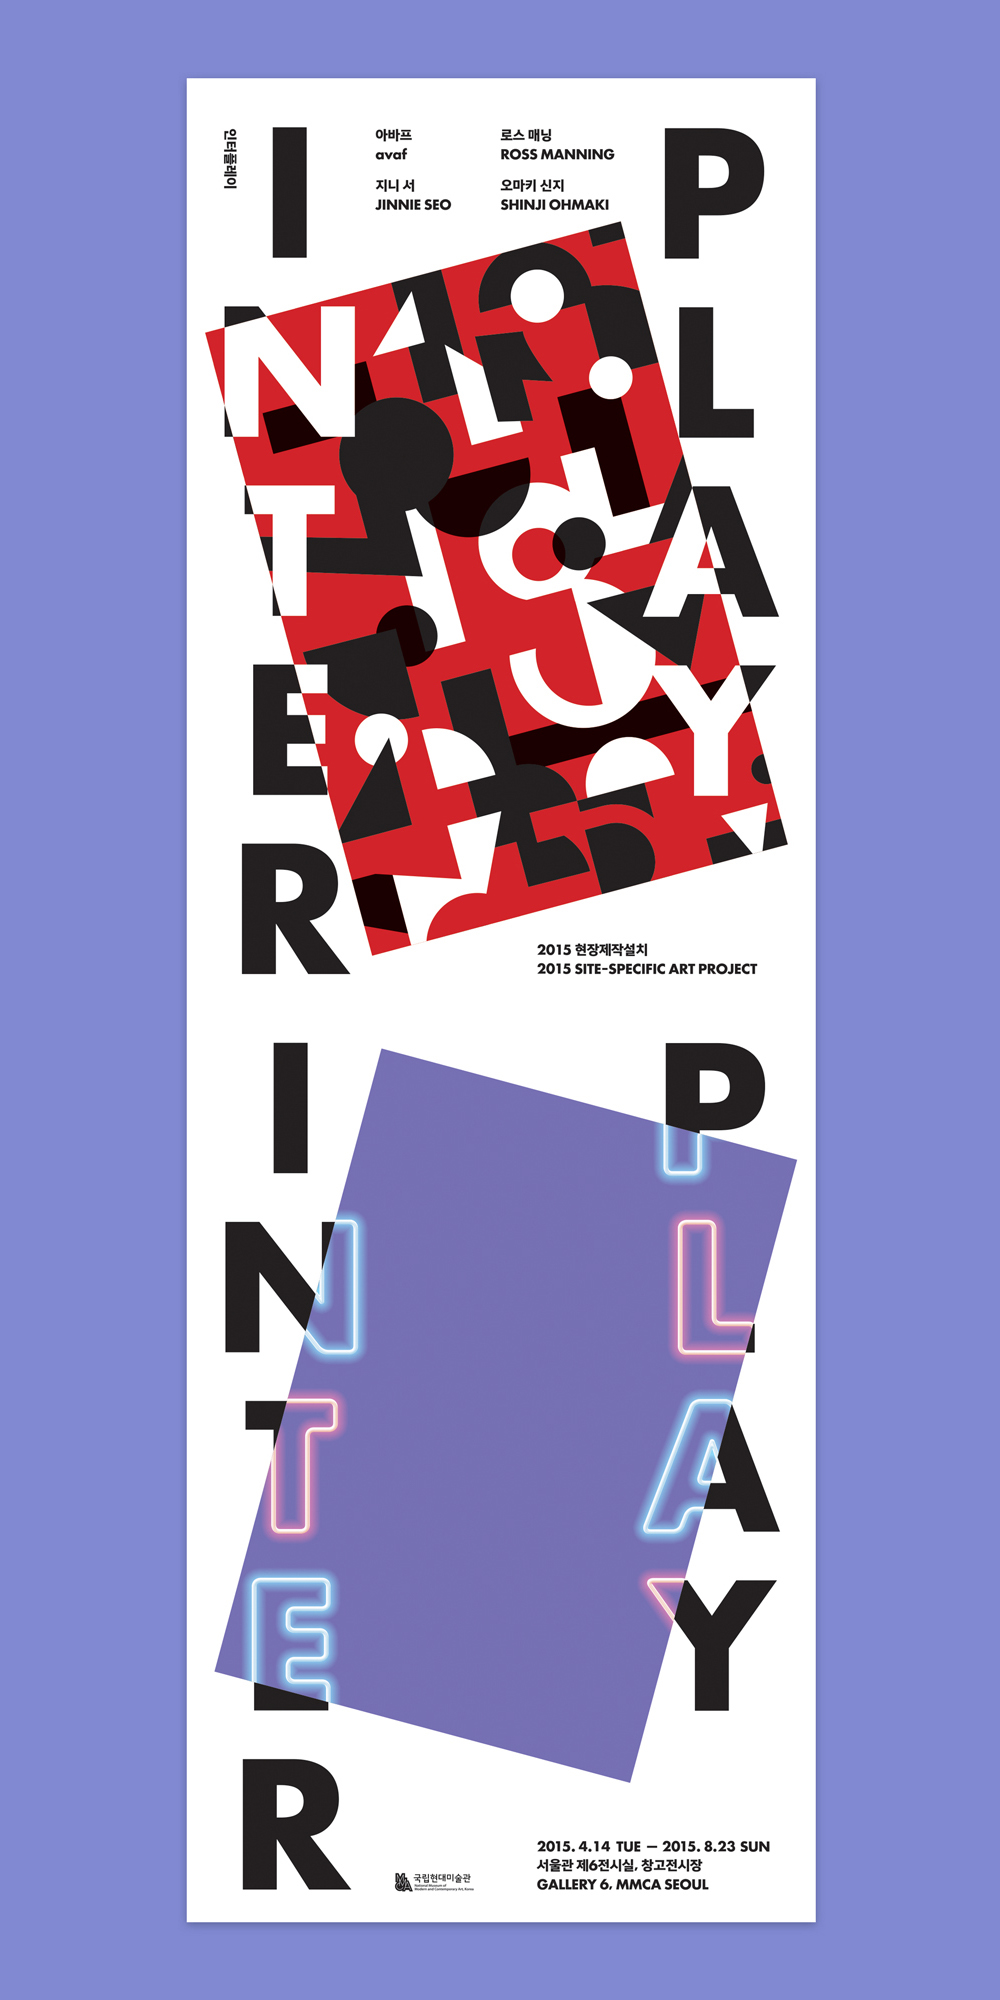 poster MMCA  seoul Korea ORDINARYPEOPLE